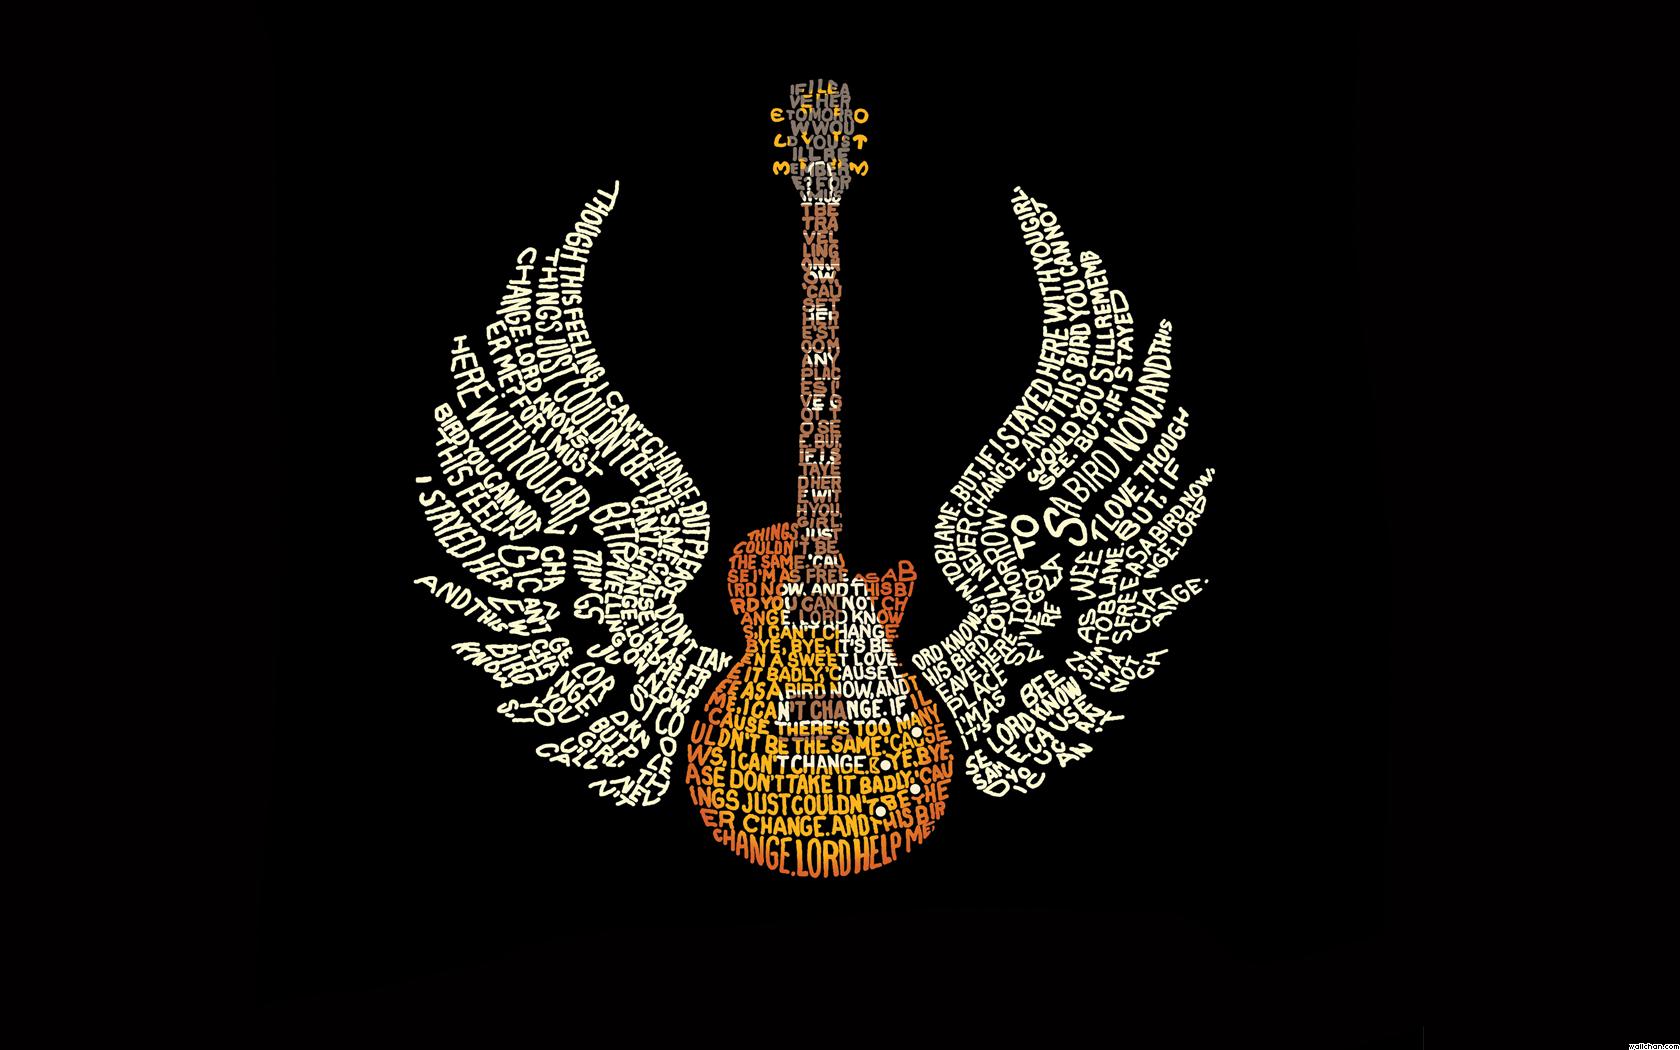 Black Guitar Wallpaper - Black Guitar Wallpaper